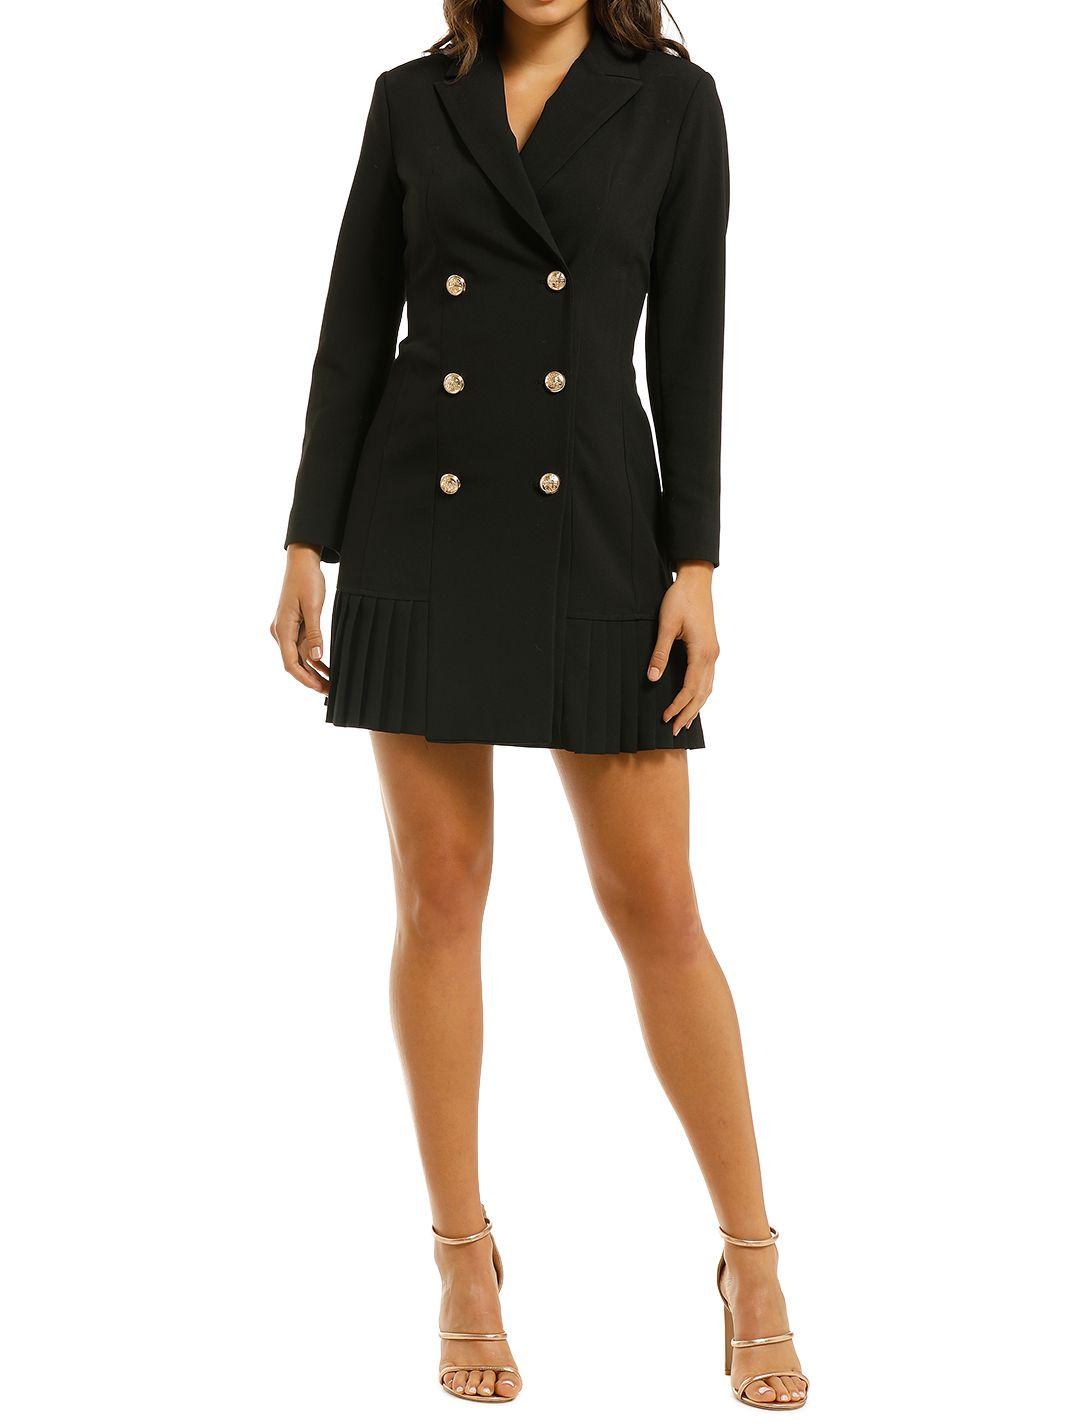 Coop-by-Trelise-Cooper-Happy-Blaze-Dress-Black-Front